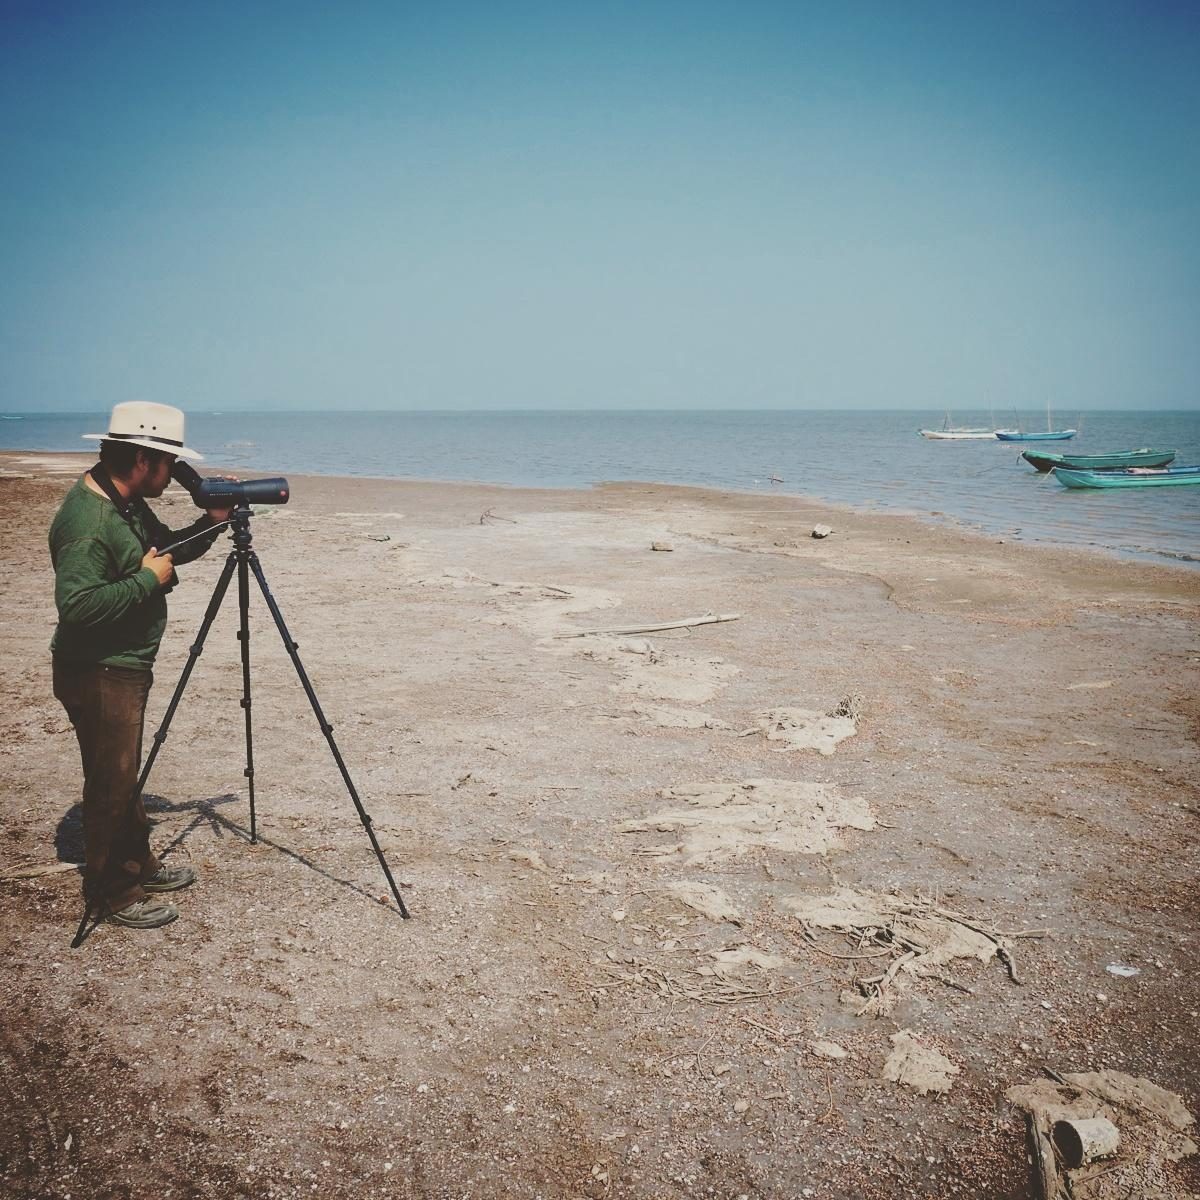 Eric scans for shorebirds at the Mar Muerto. Noah Strycker